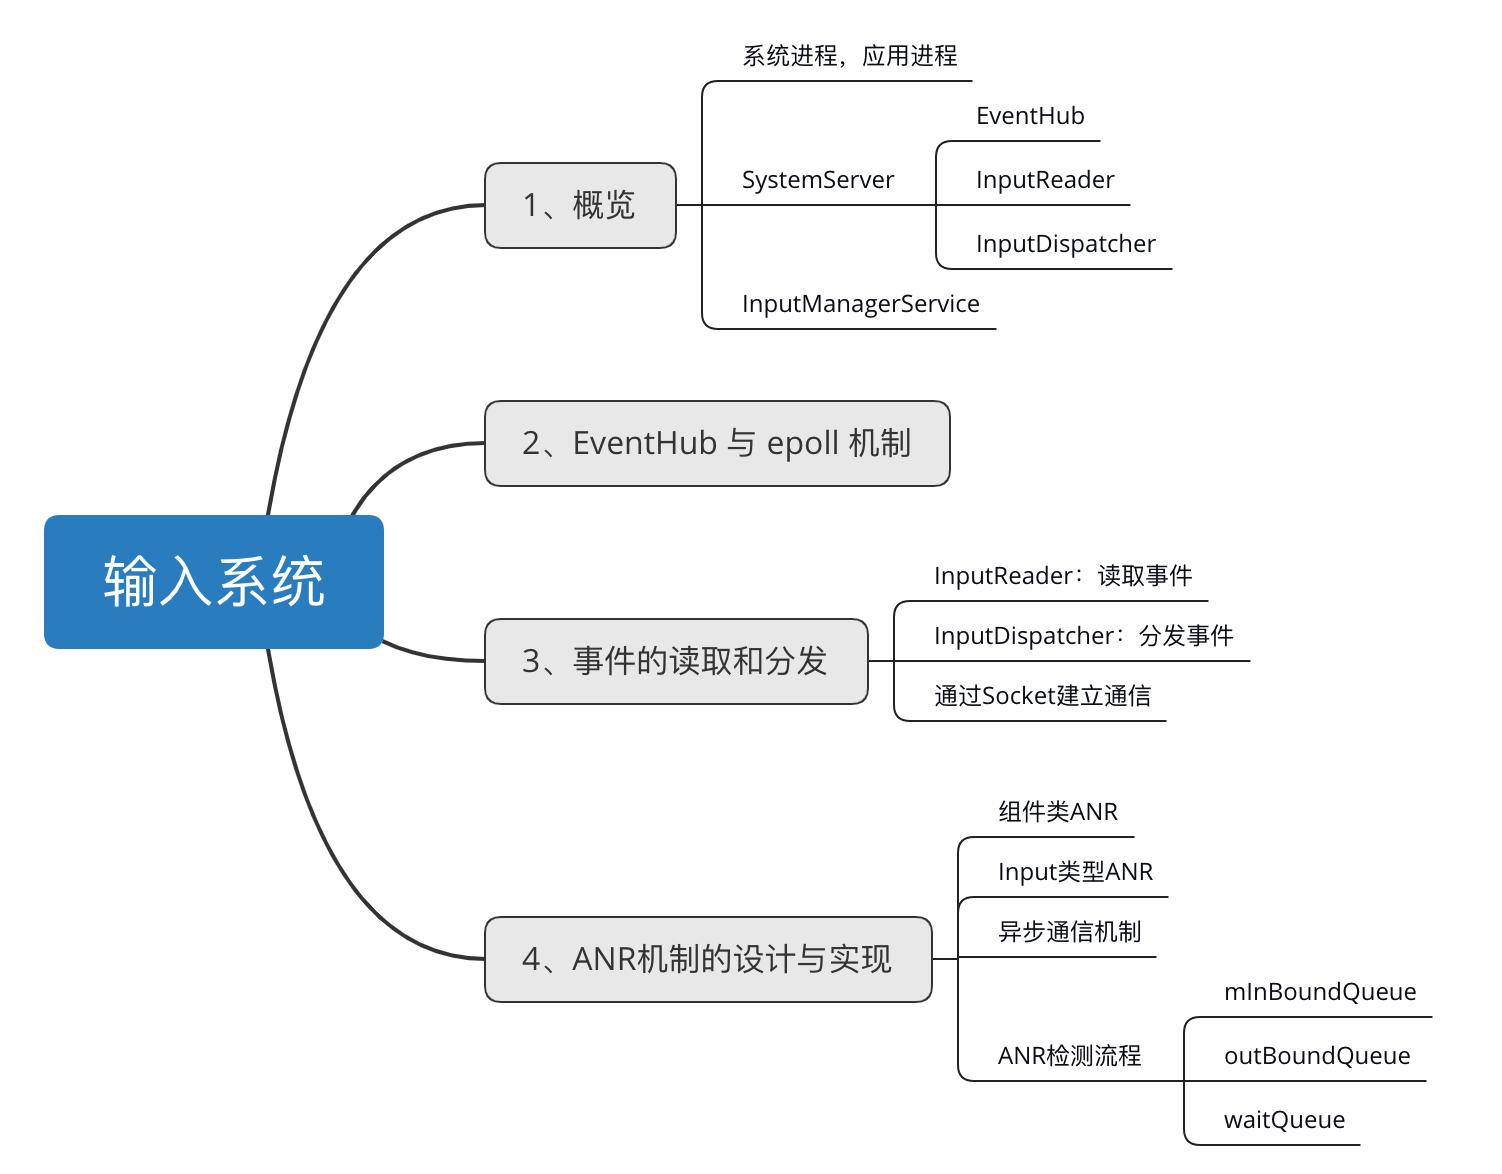 反思 Android 输入系统 & ANR机制的设计与实现